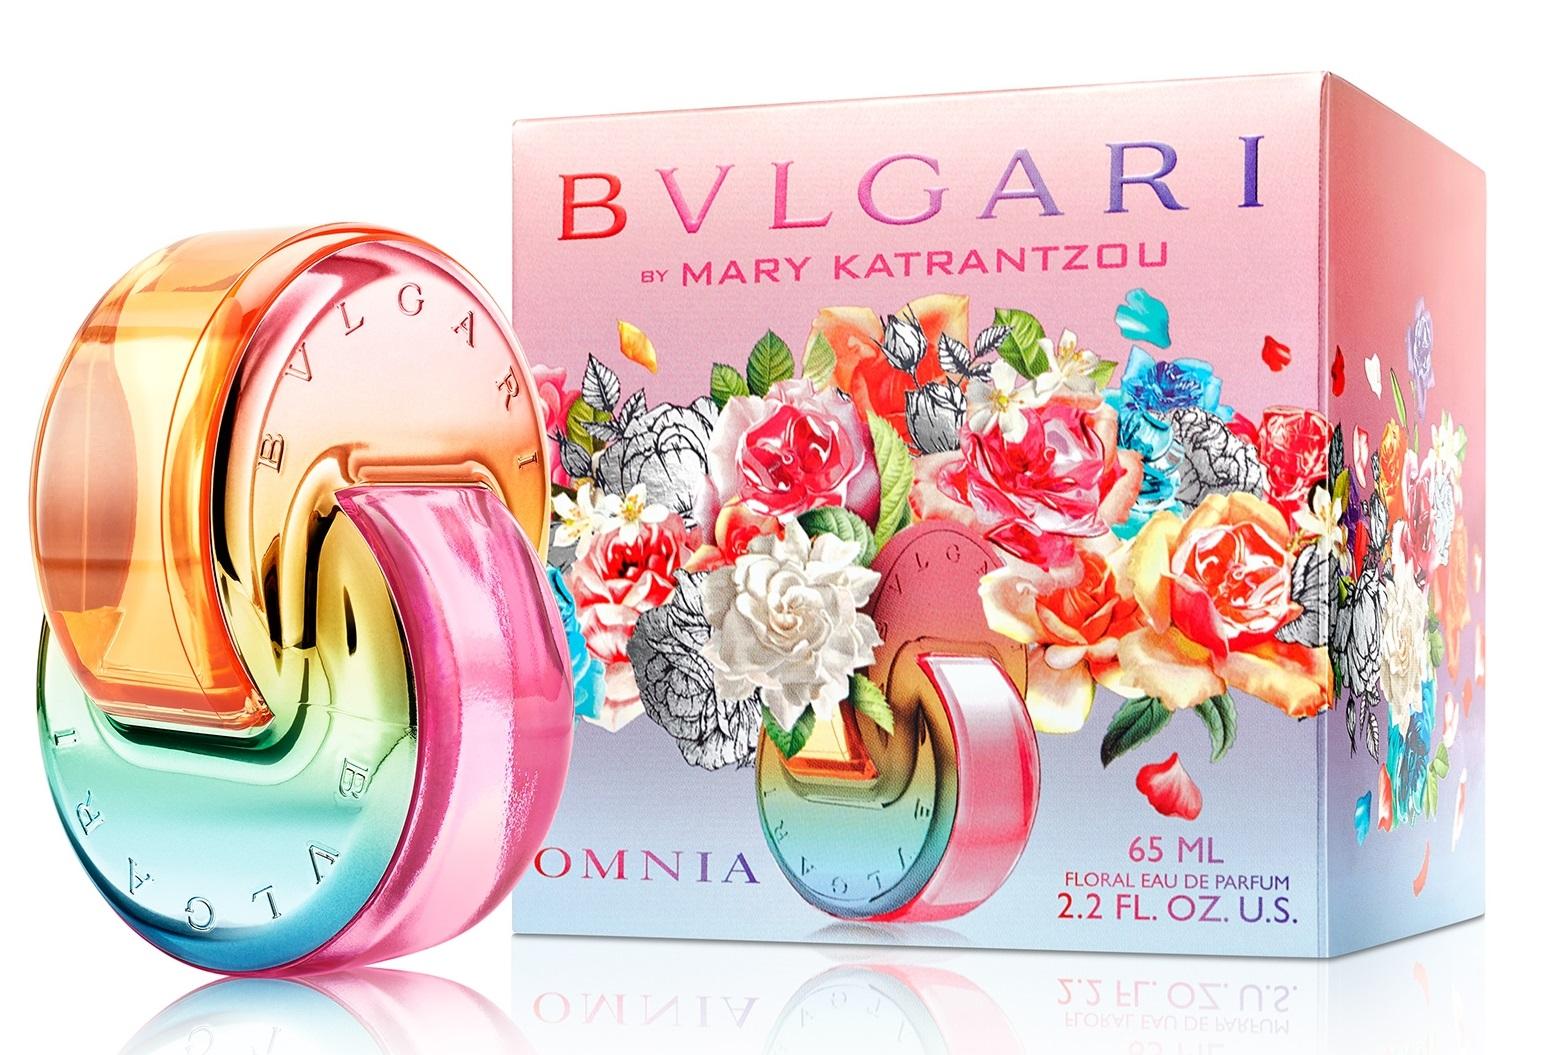 Bvlgari Omnia Edicion Capsula by Mary Katrantzou   Floral eau de parfum 65 ML